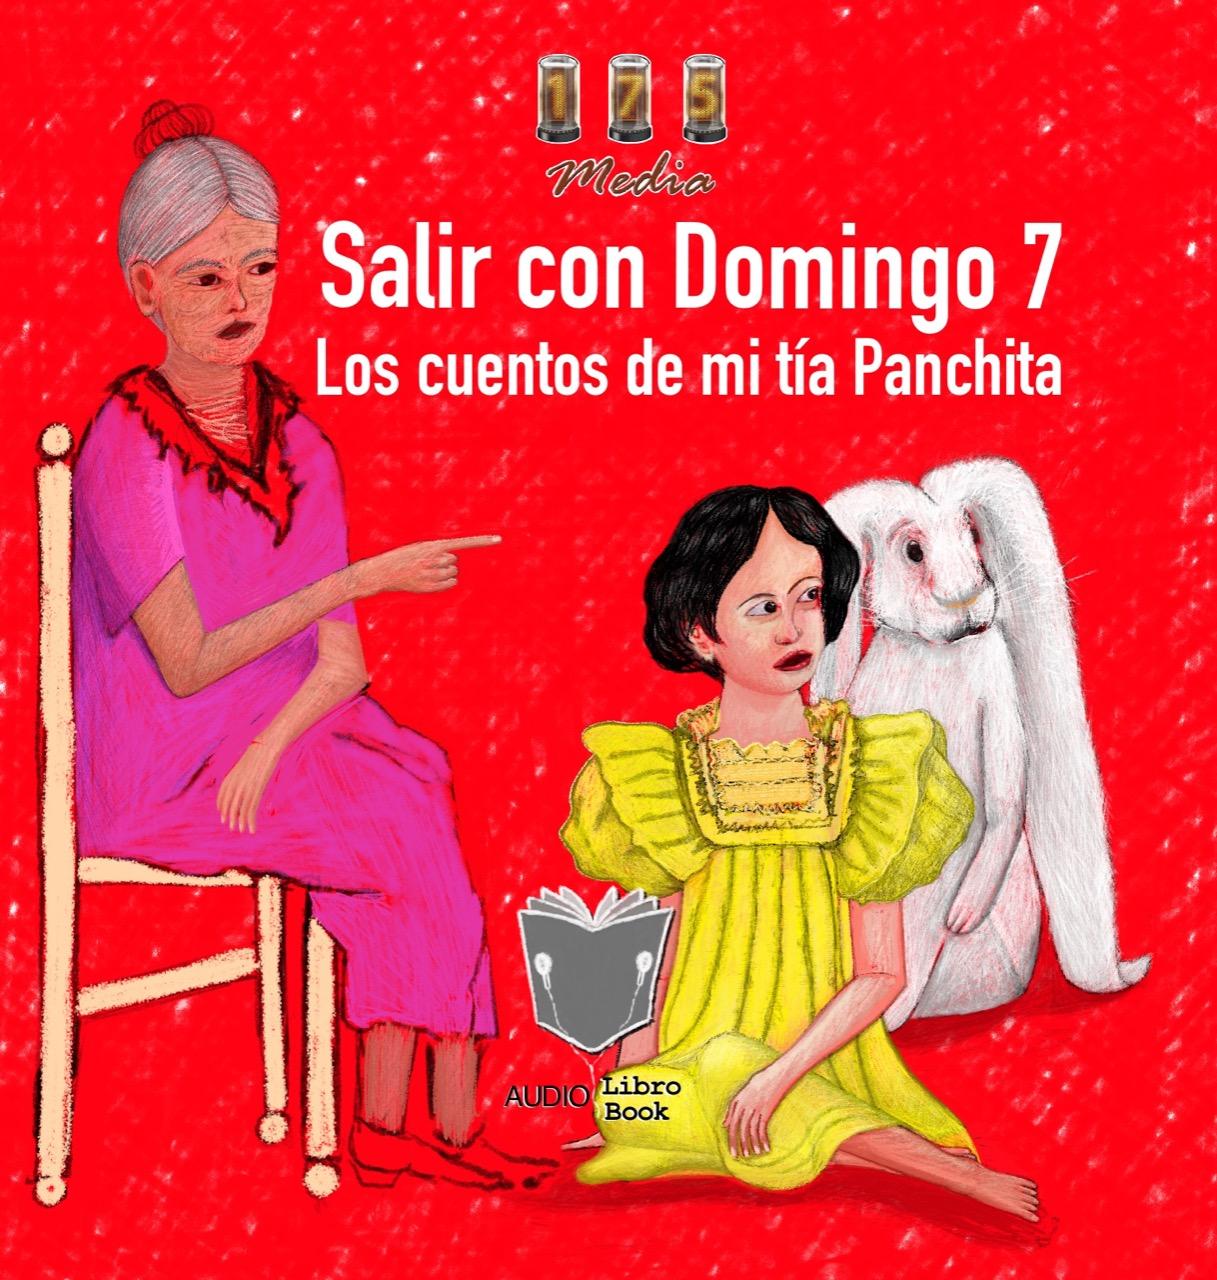 Salir con Domingo 7 - Audiobook - US$2,99